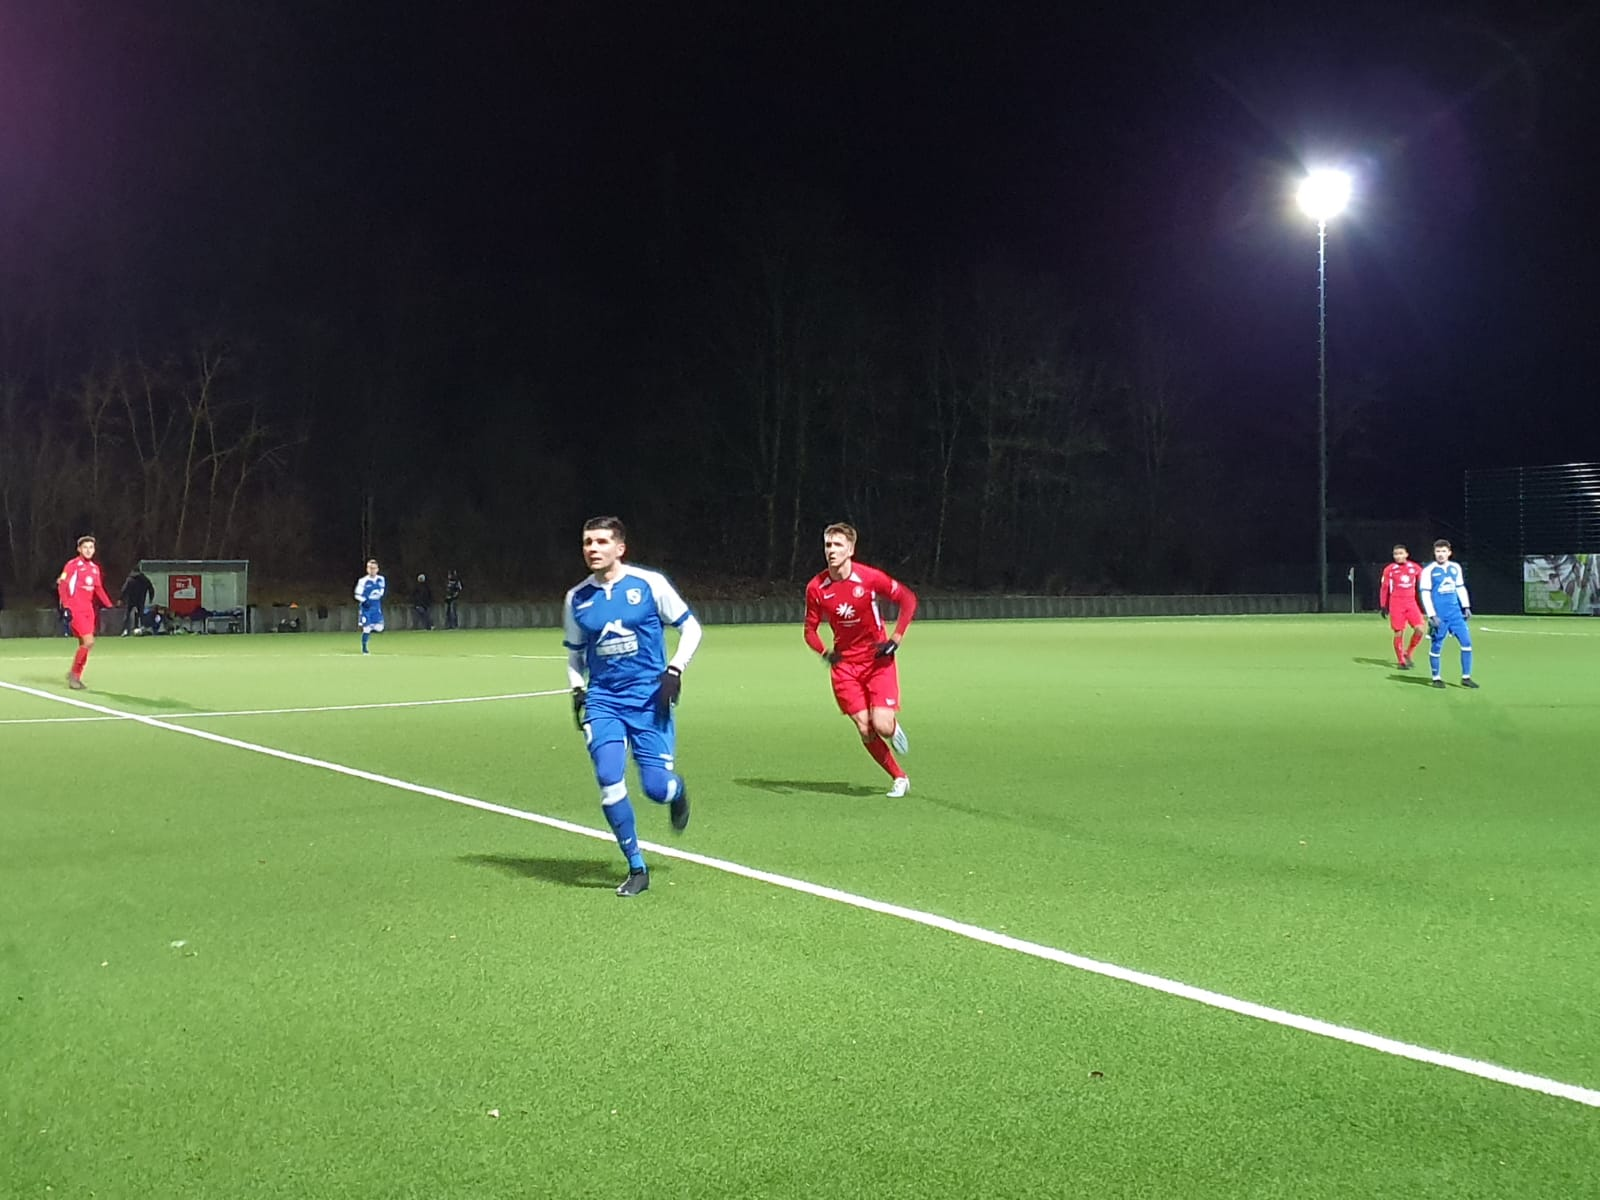 OSC Vellmar - KSV Hessen Kassel